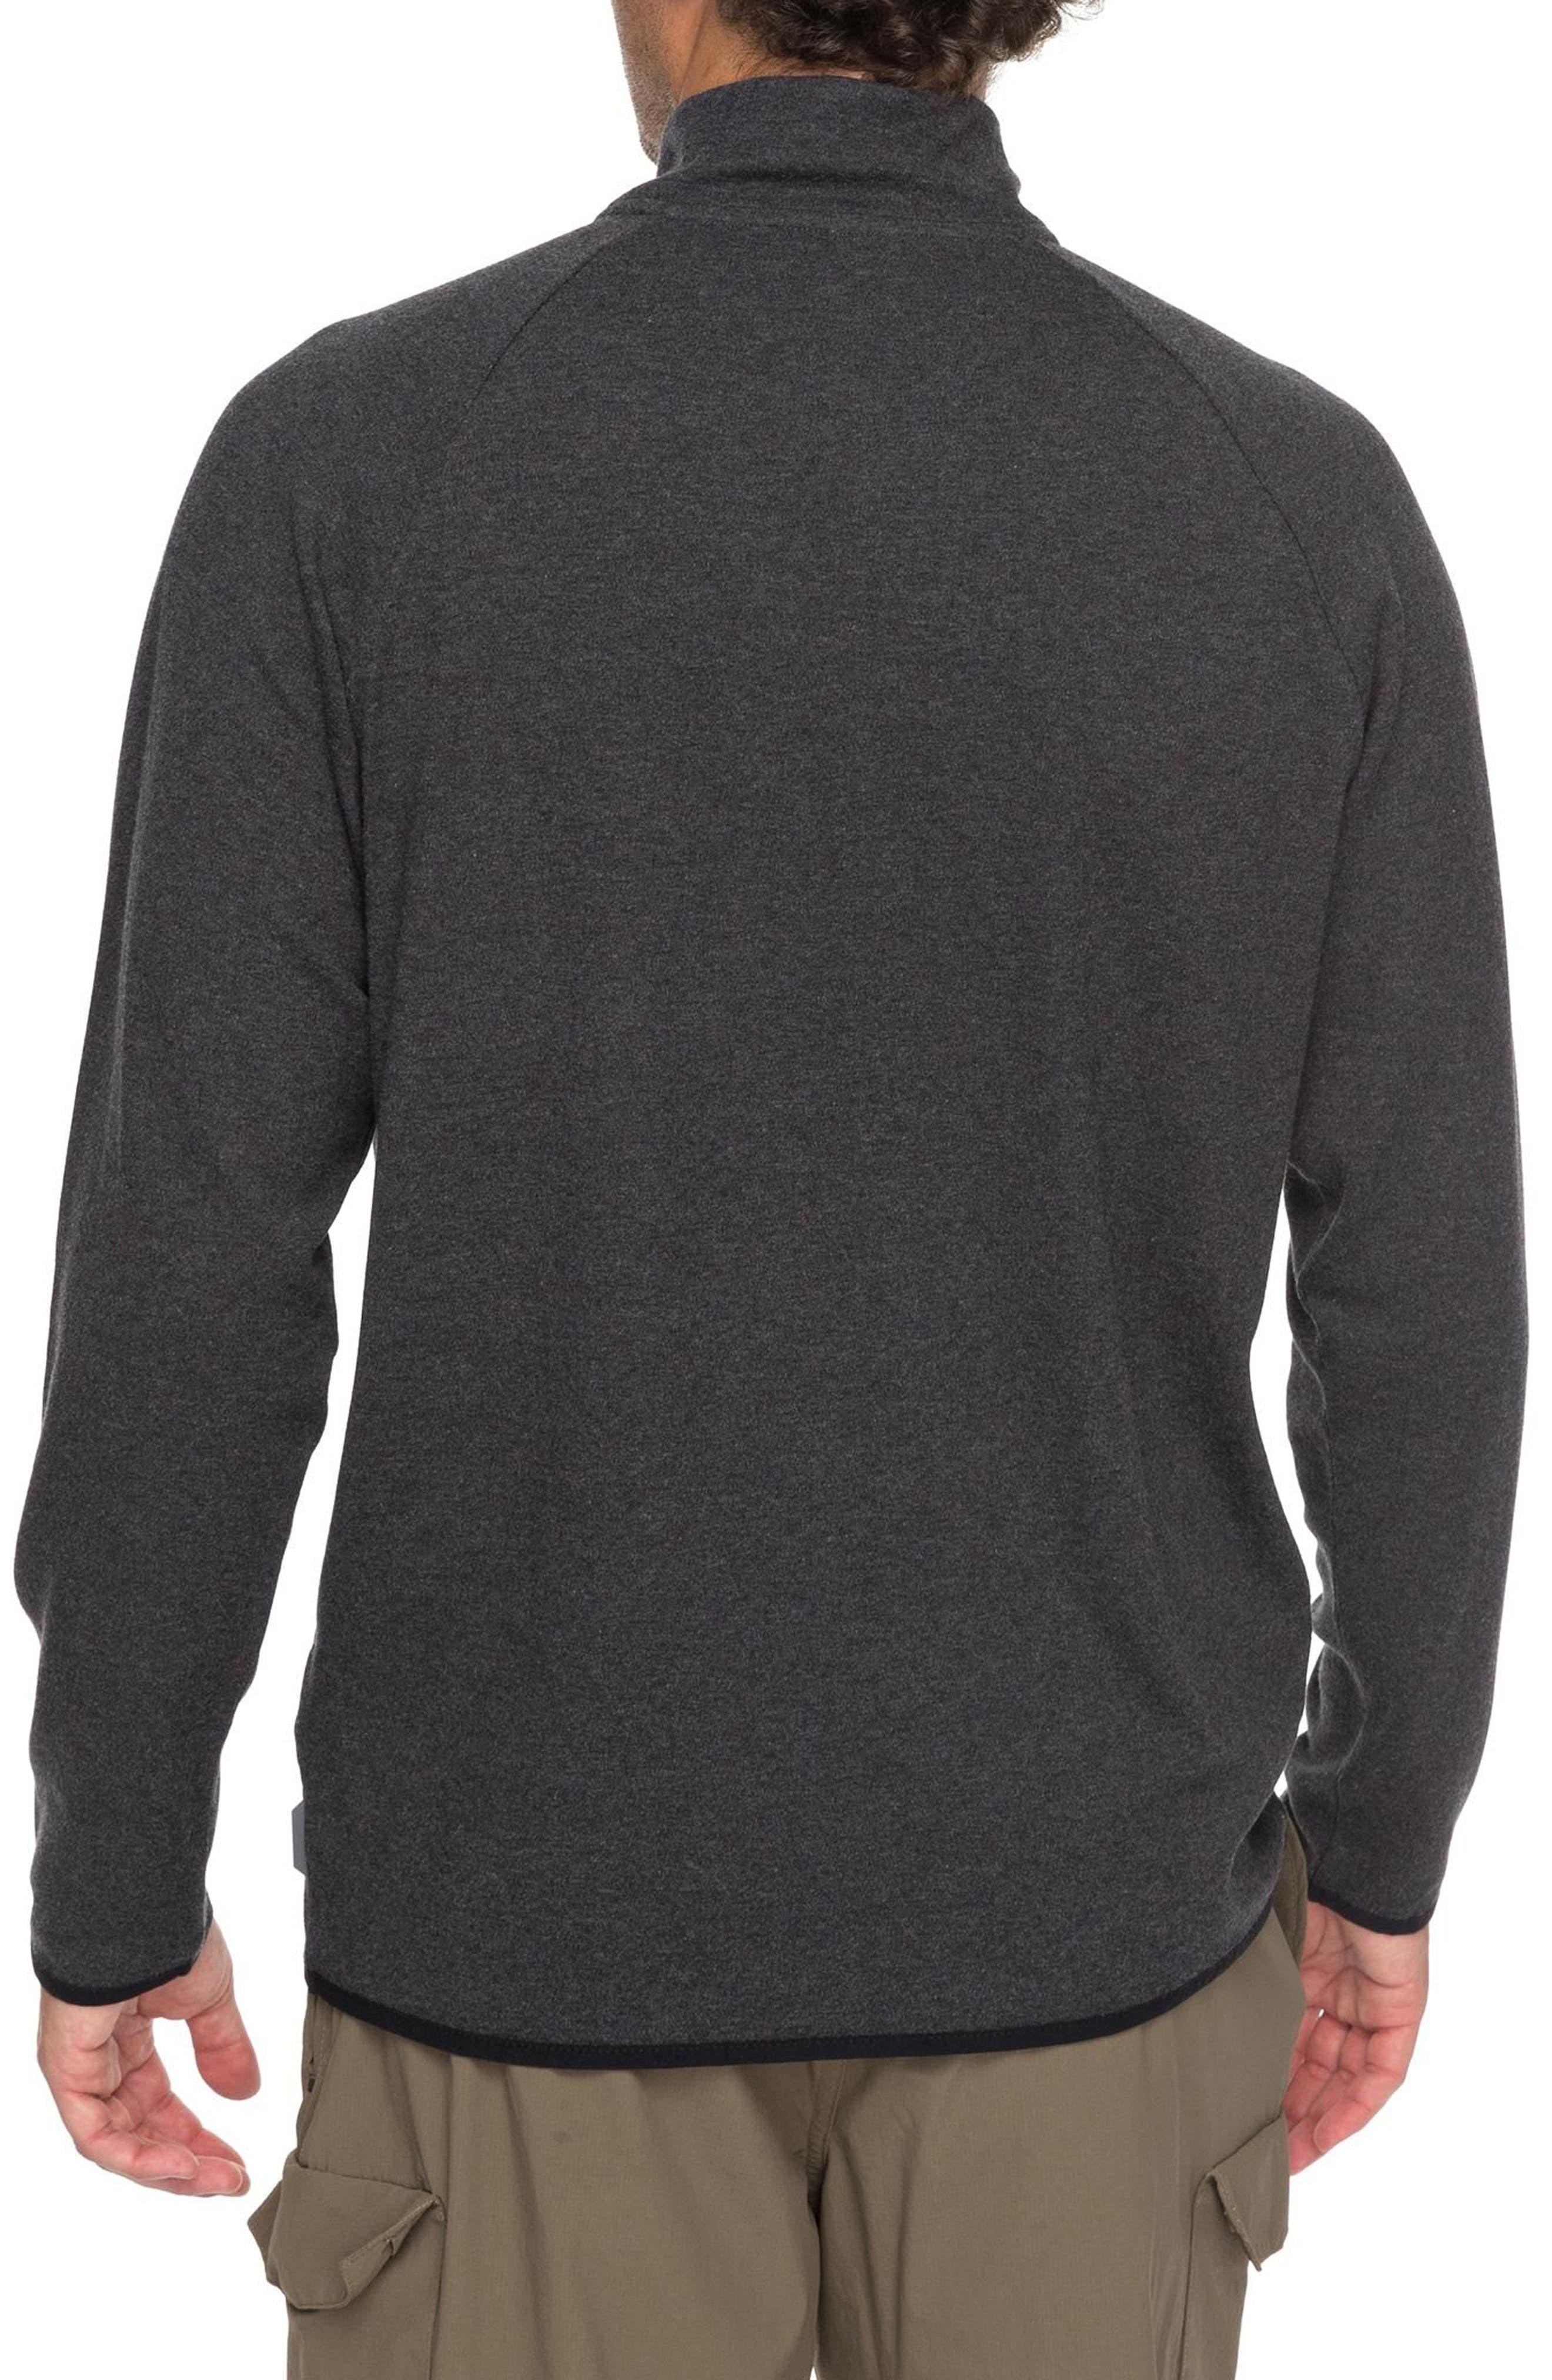 Technical Sweatshirt,                             Alternate thumbnail 2, color,                             005